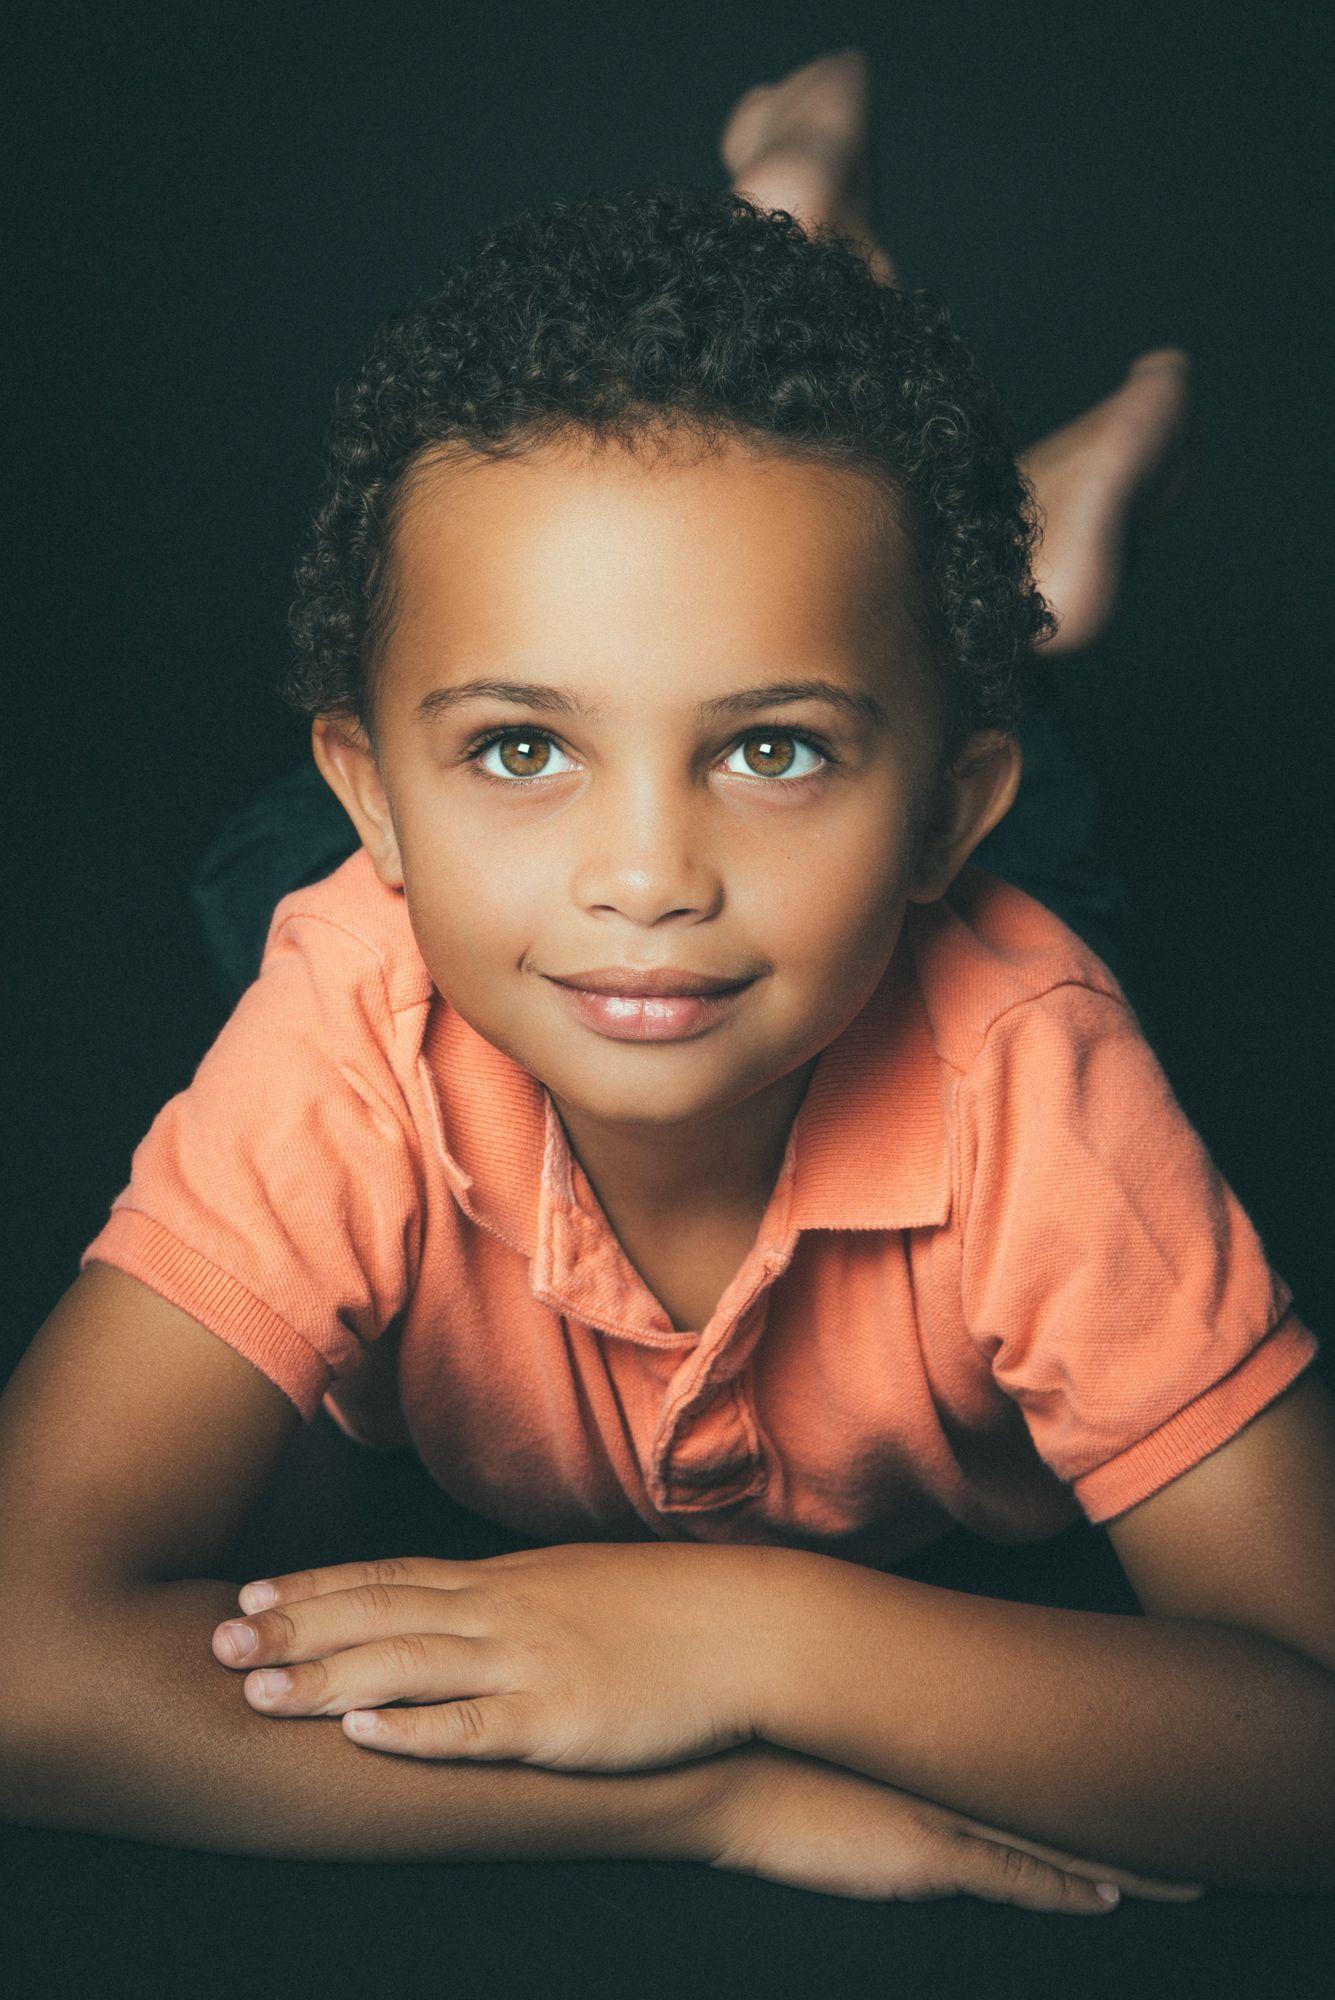 Child photography indoor studio photoshoot